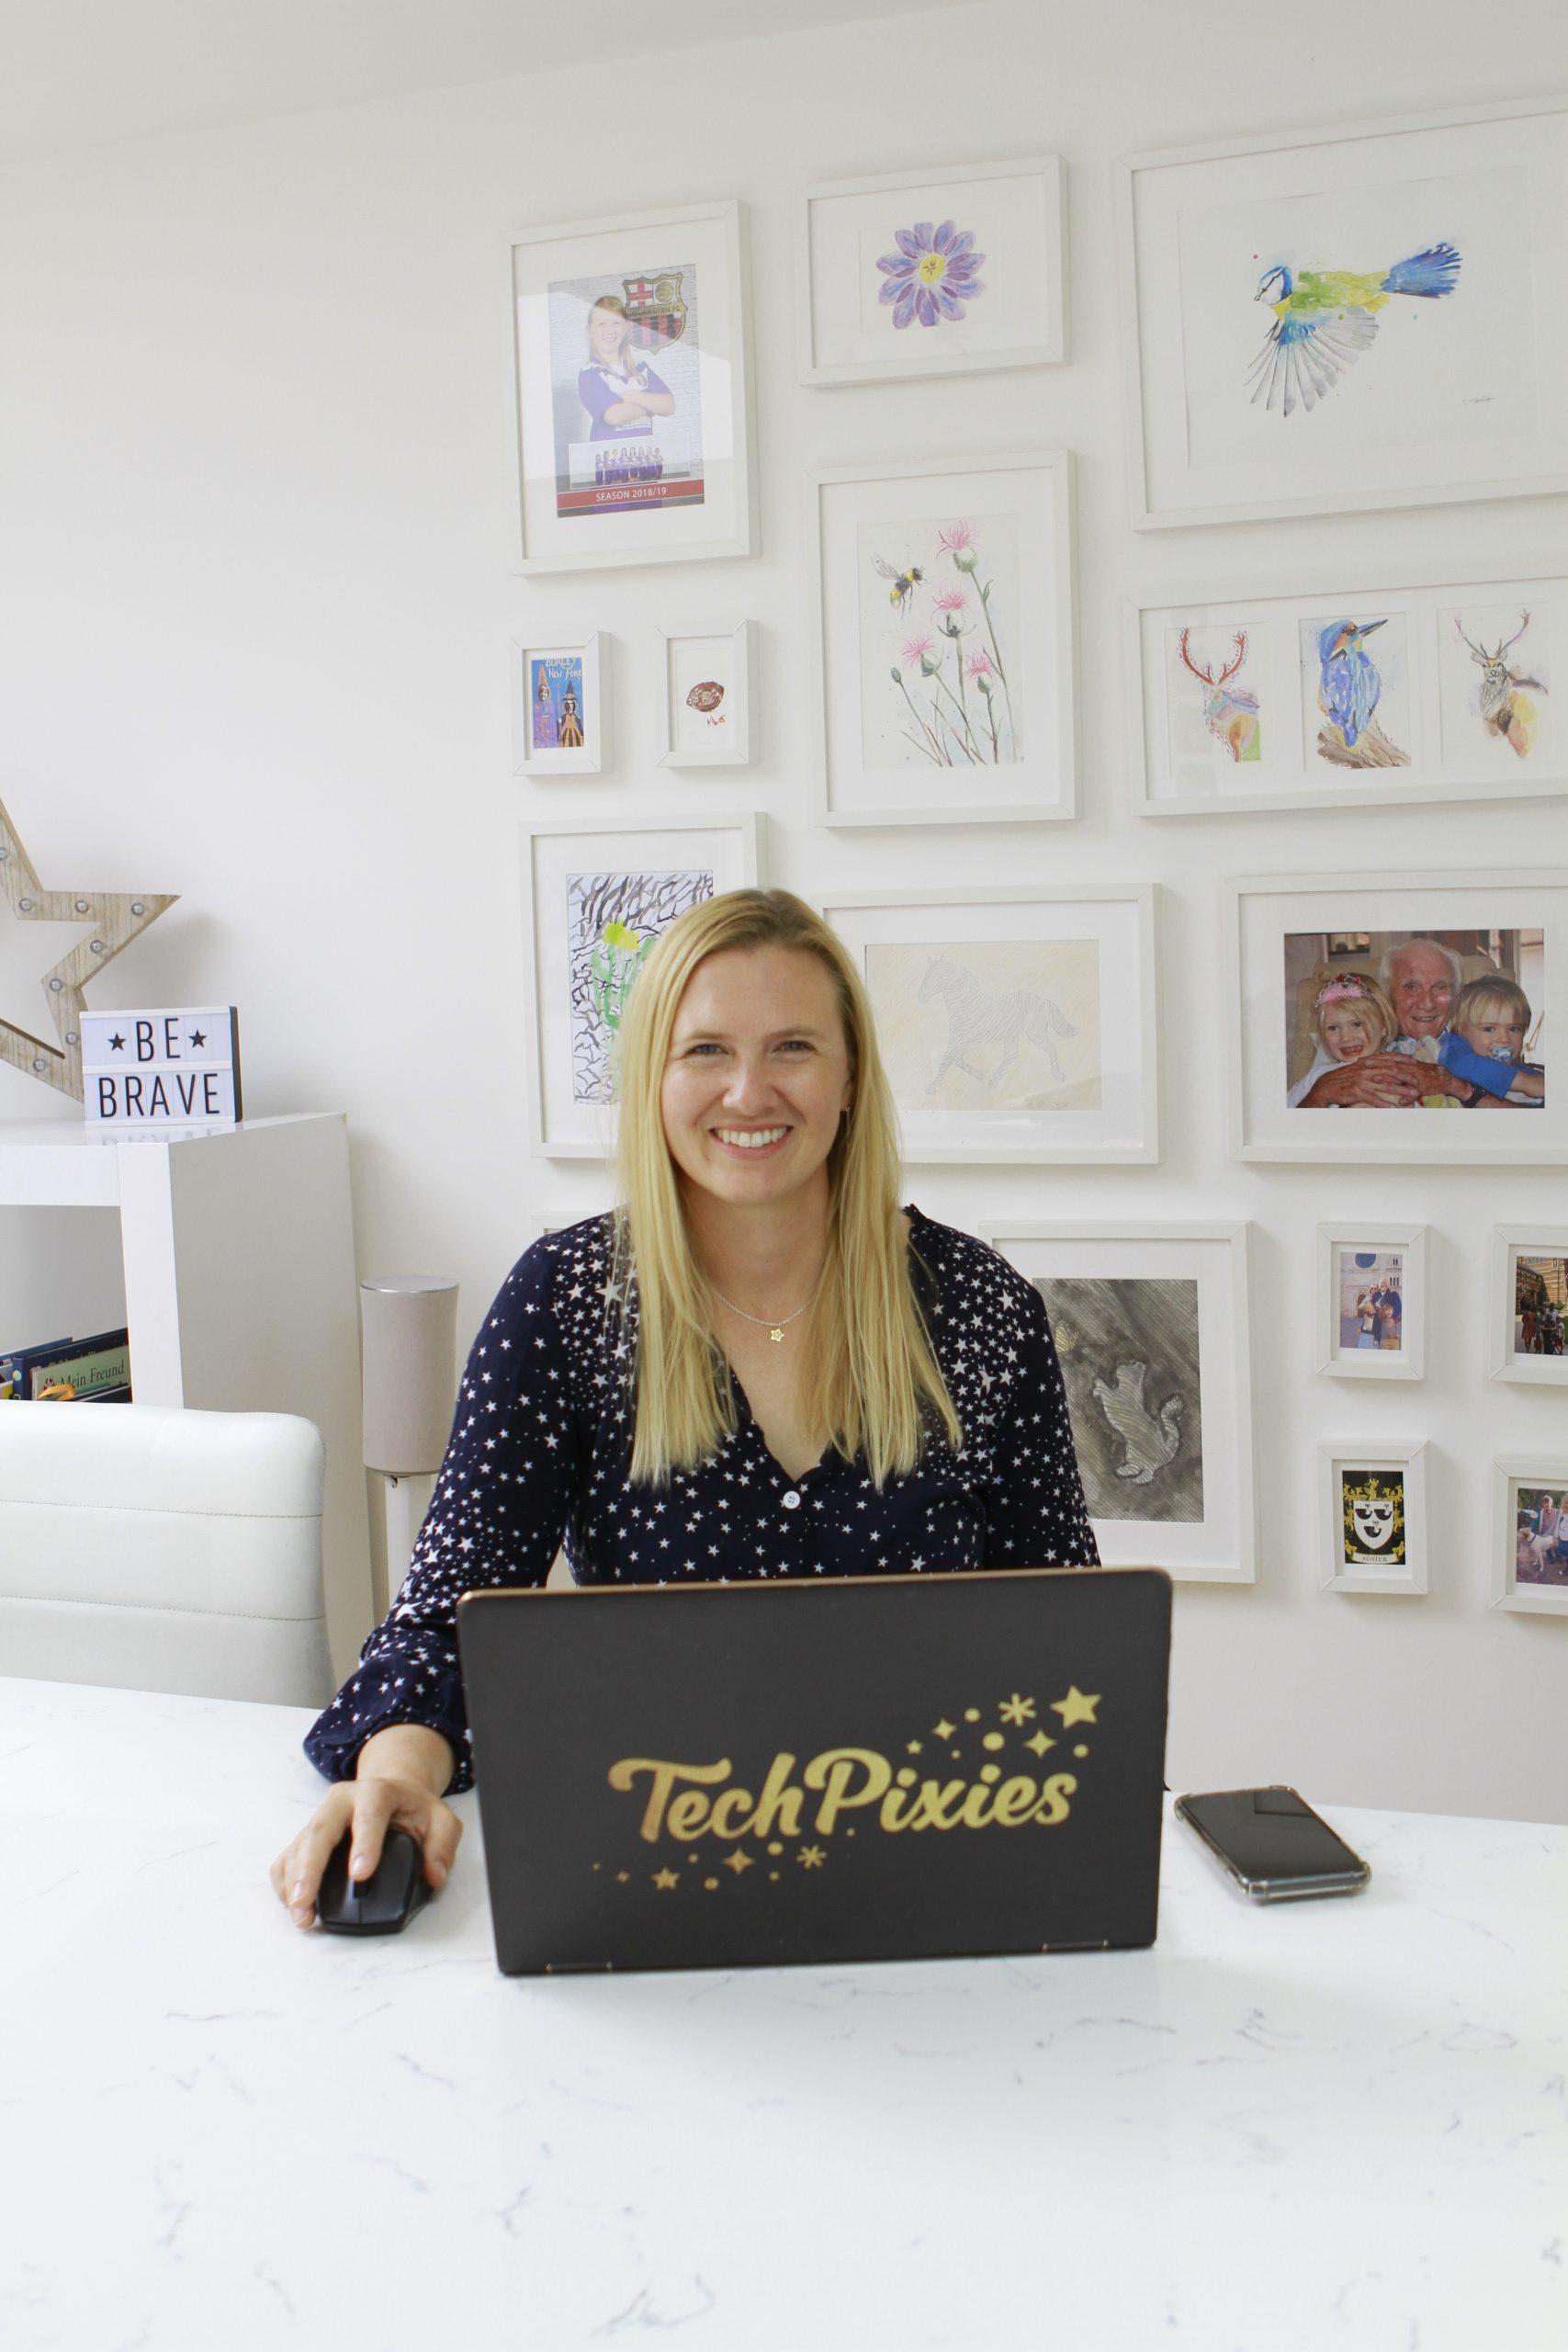 branding small business female tech - corporate headshot photography